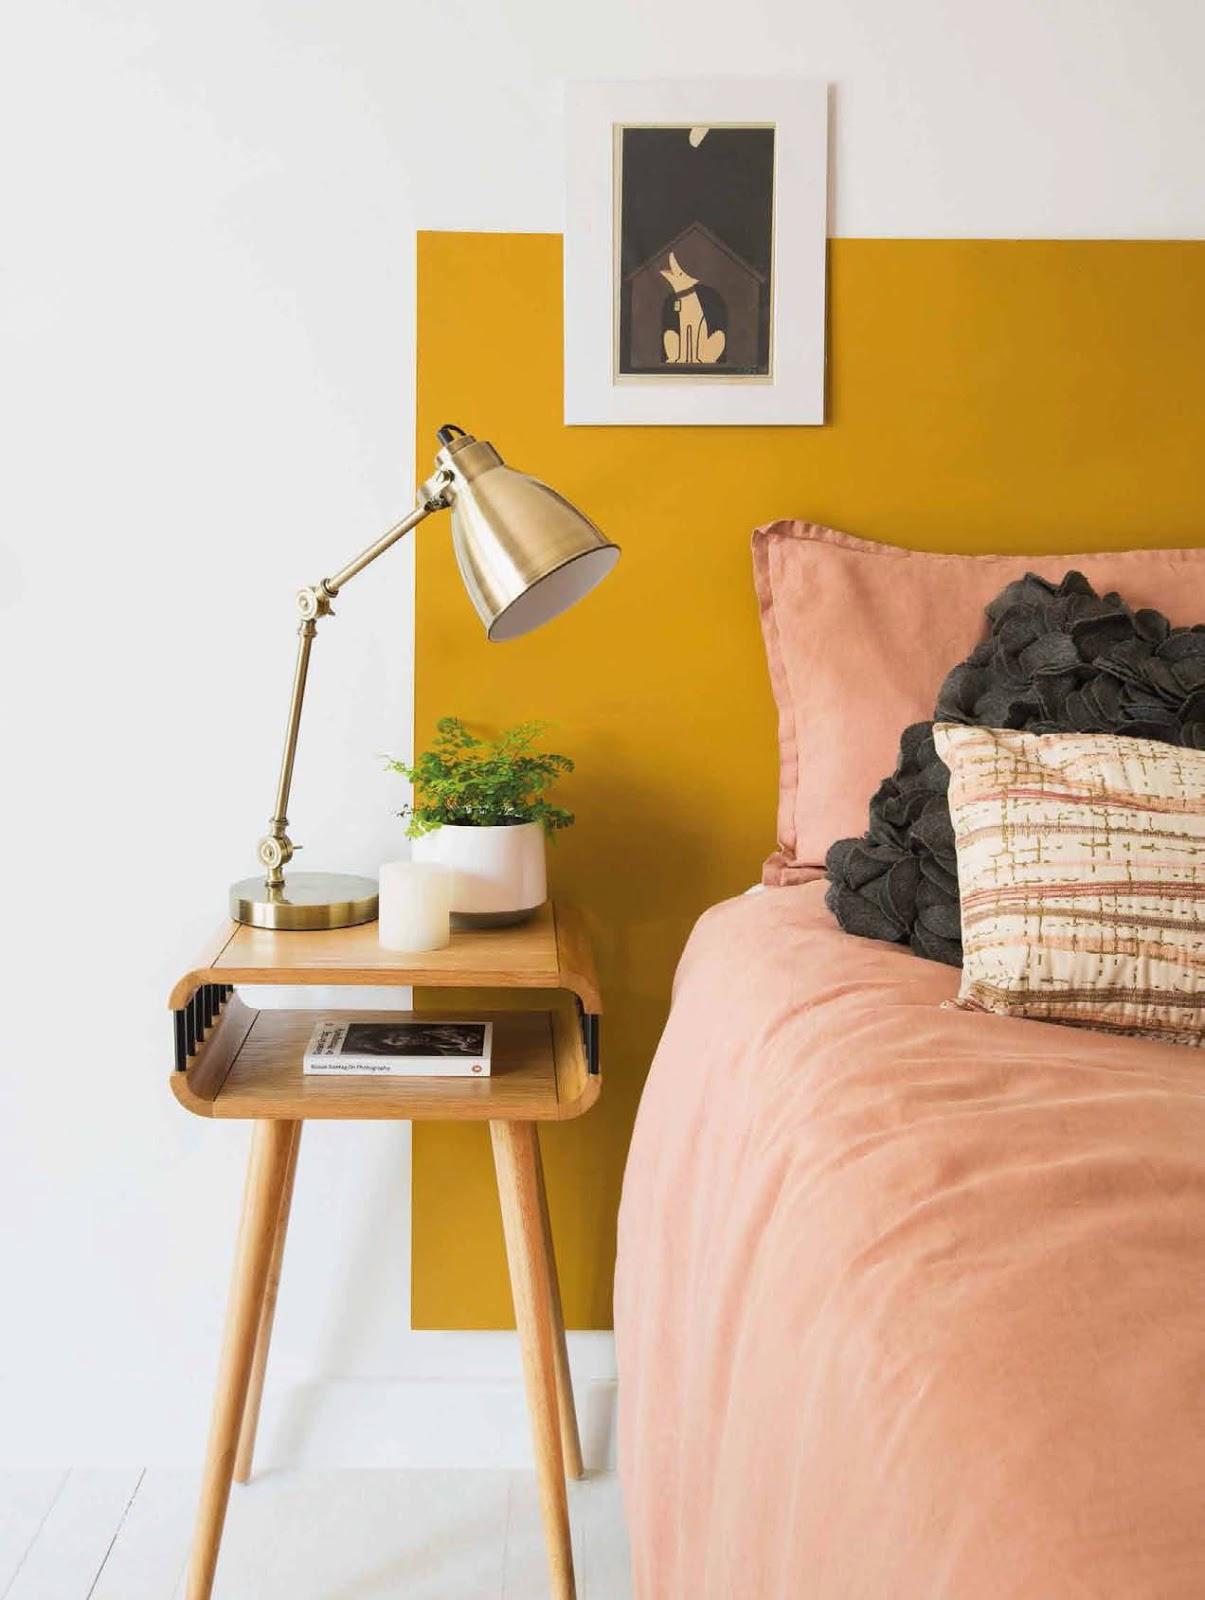 Idee casa - Parete testata letto dipinta ...